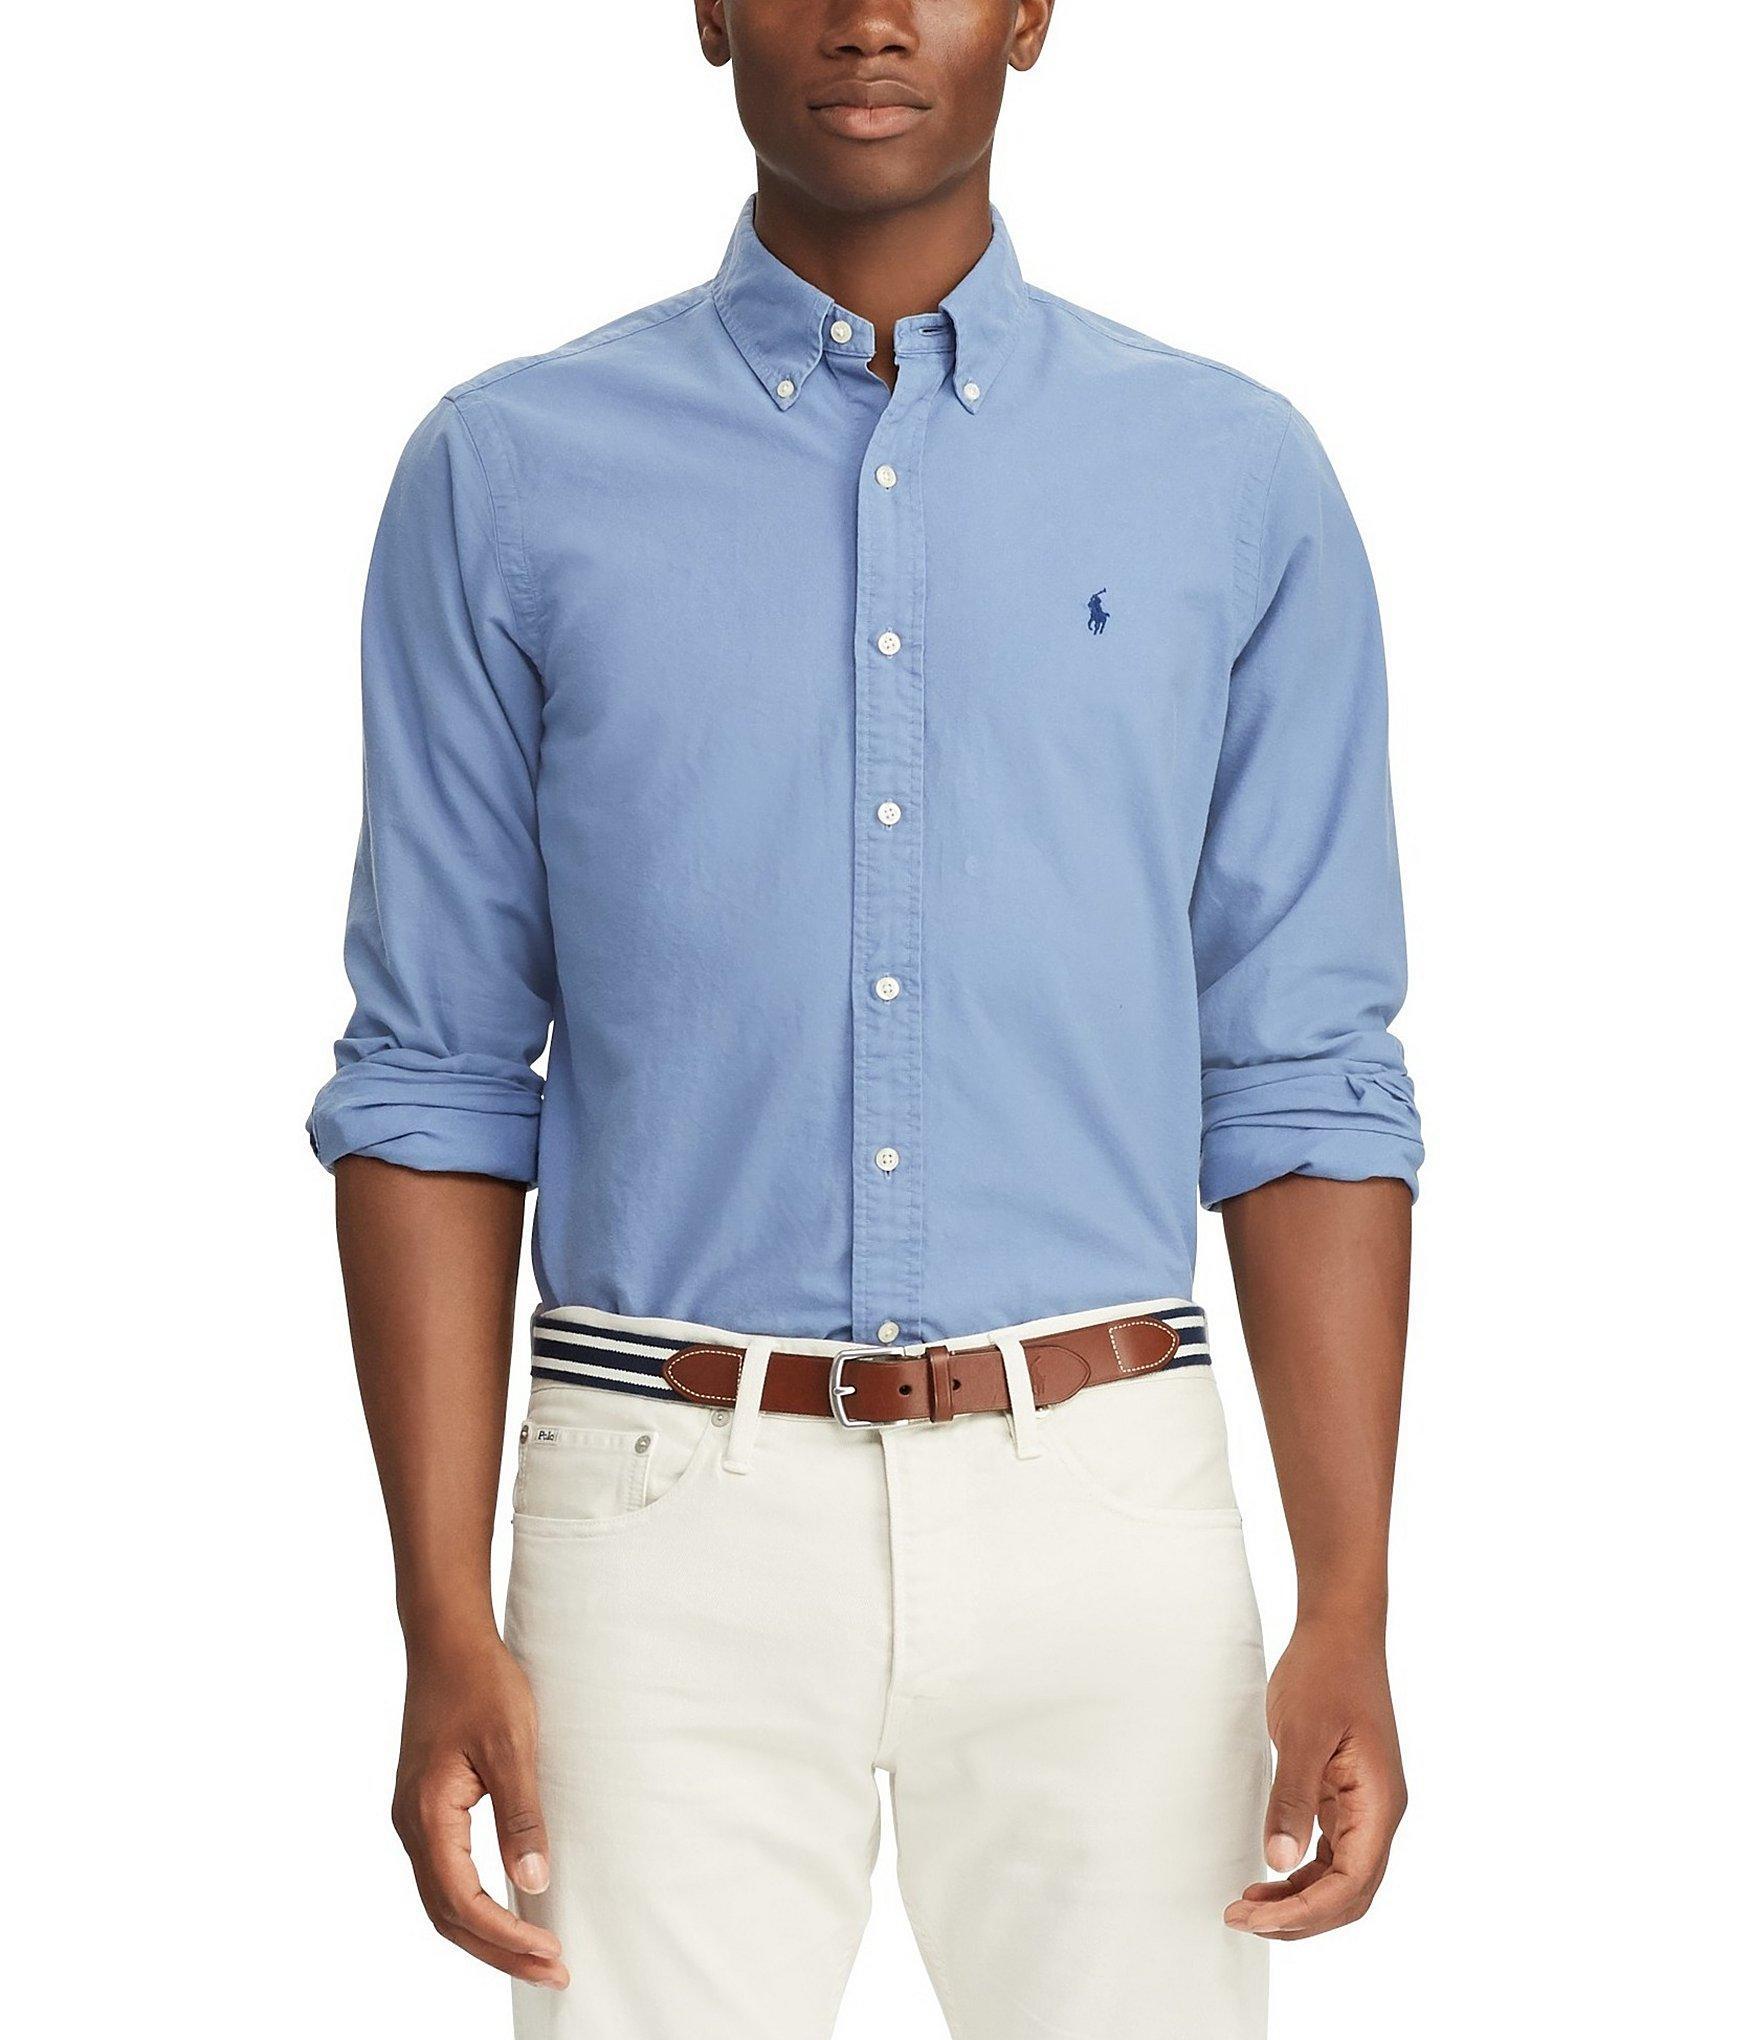 8d05aaeb Lyst - Polo Ralph Lauren Solid Garment-dye Oxford Long-sleeve Woven ...